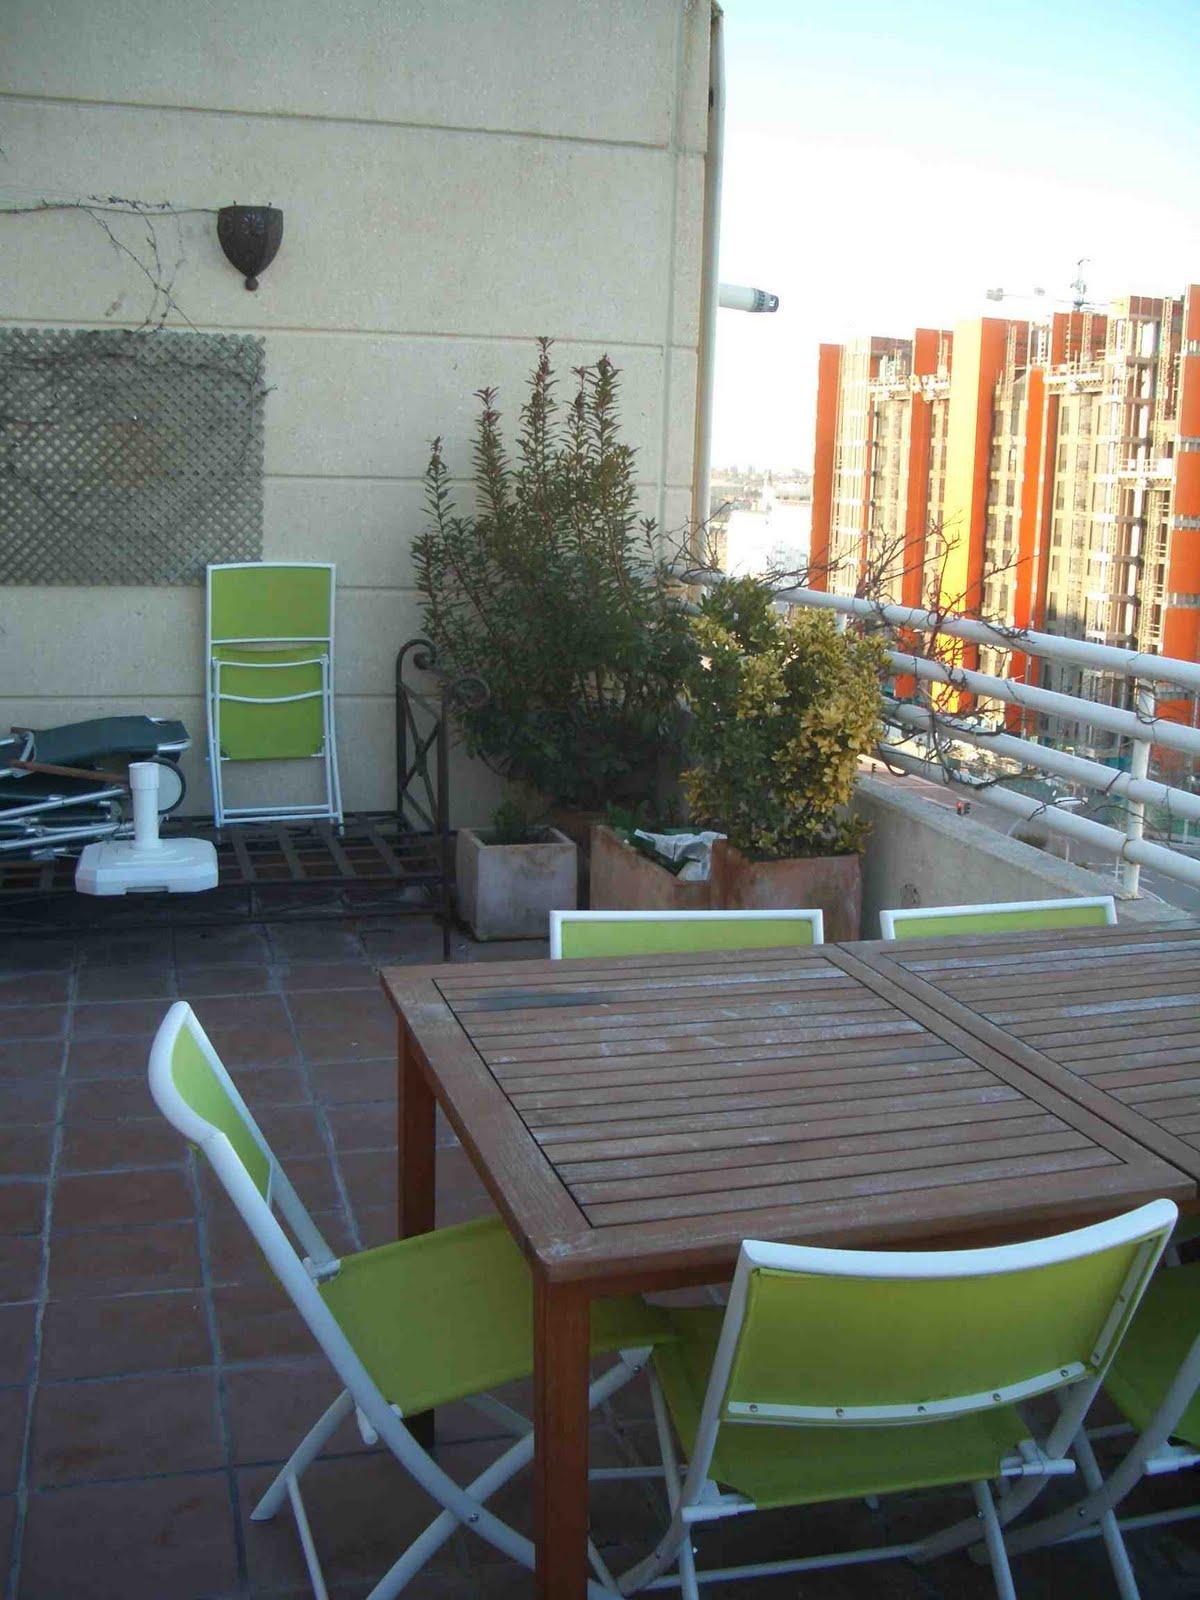 Azulejos rusticos para patios cool ideas para decorar for Decorar terrazas barato